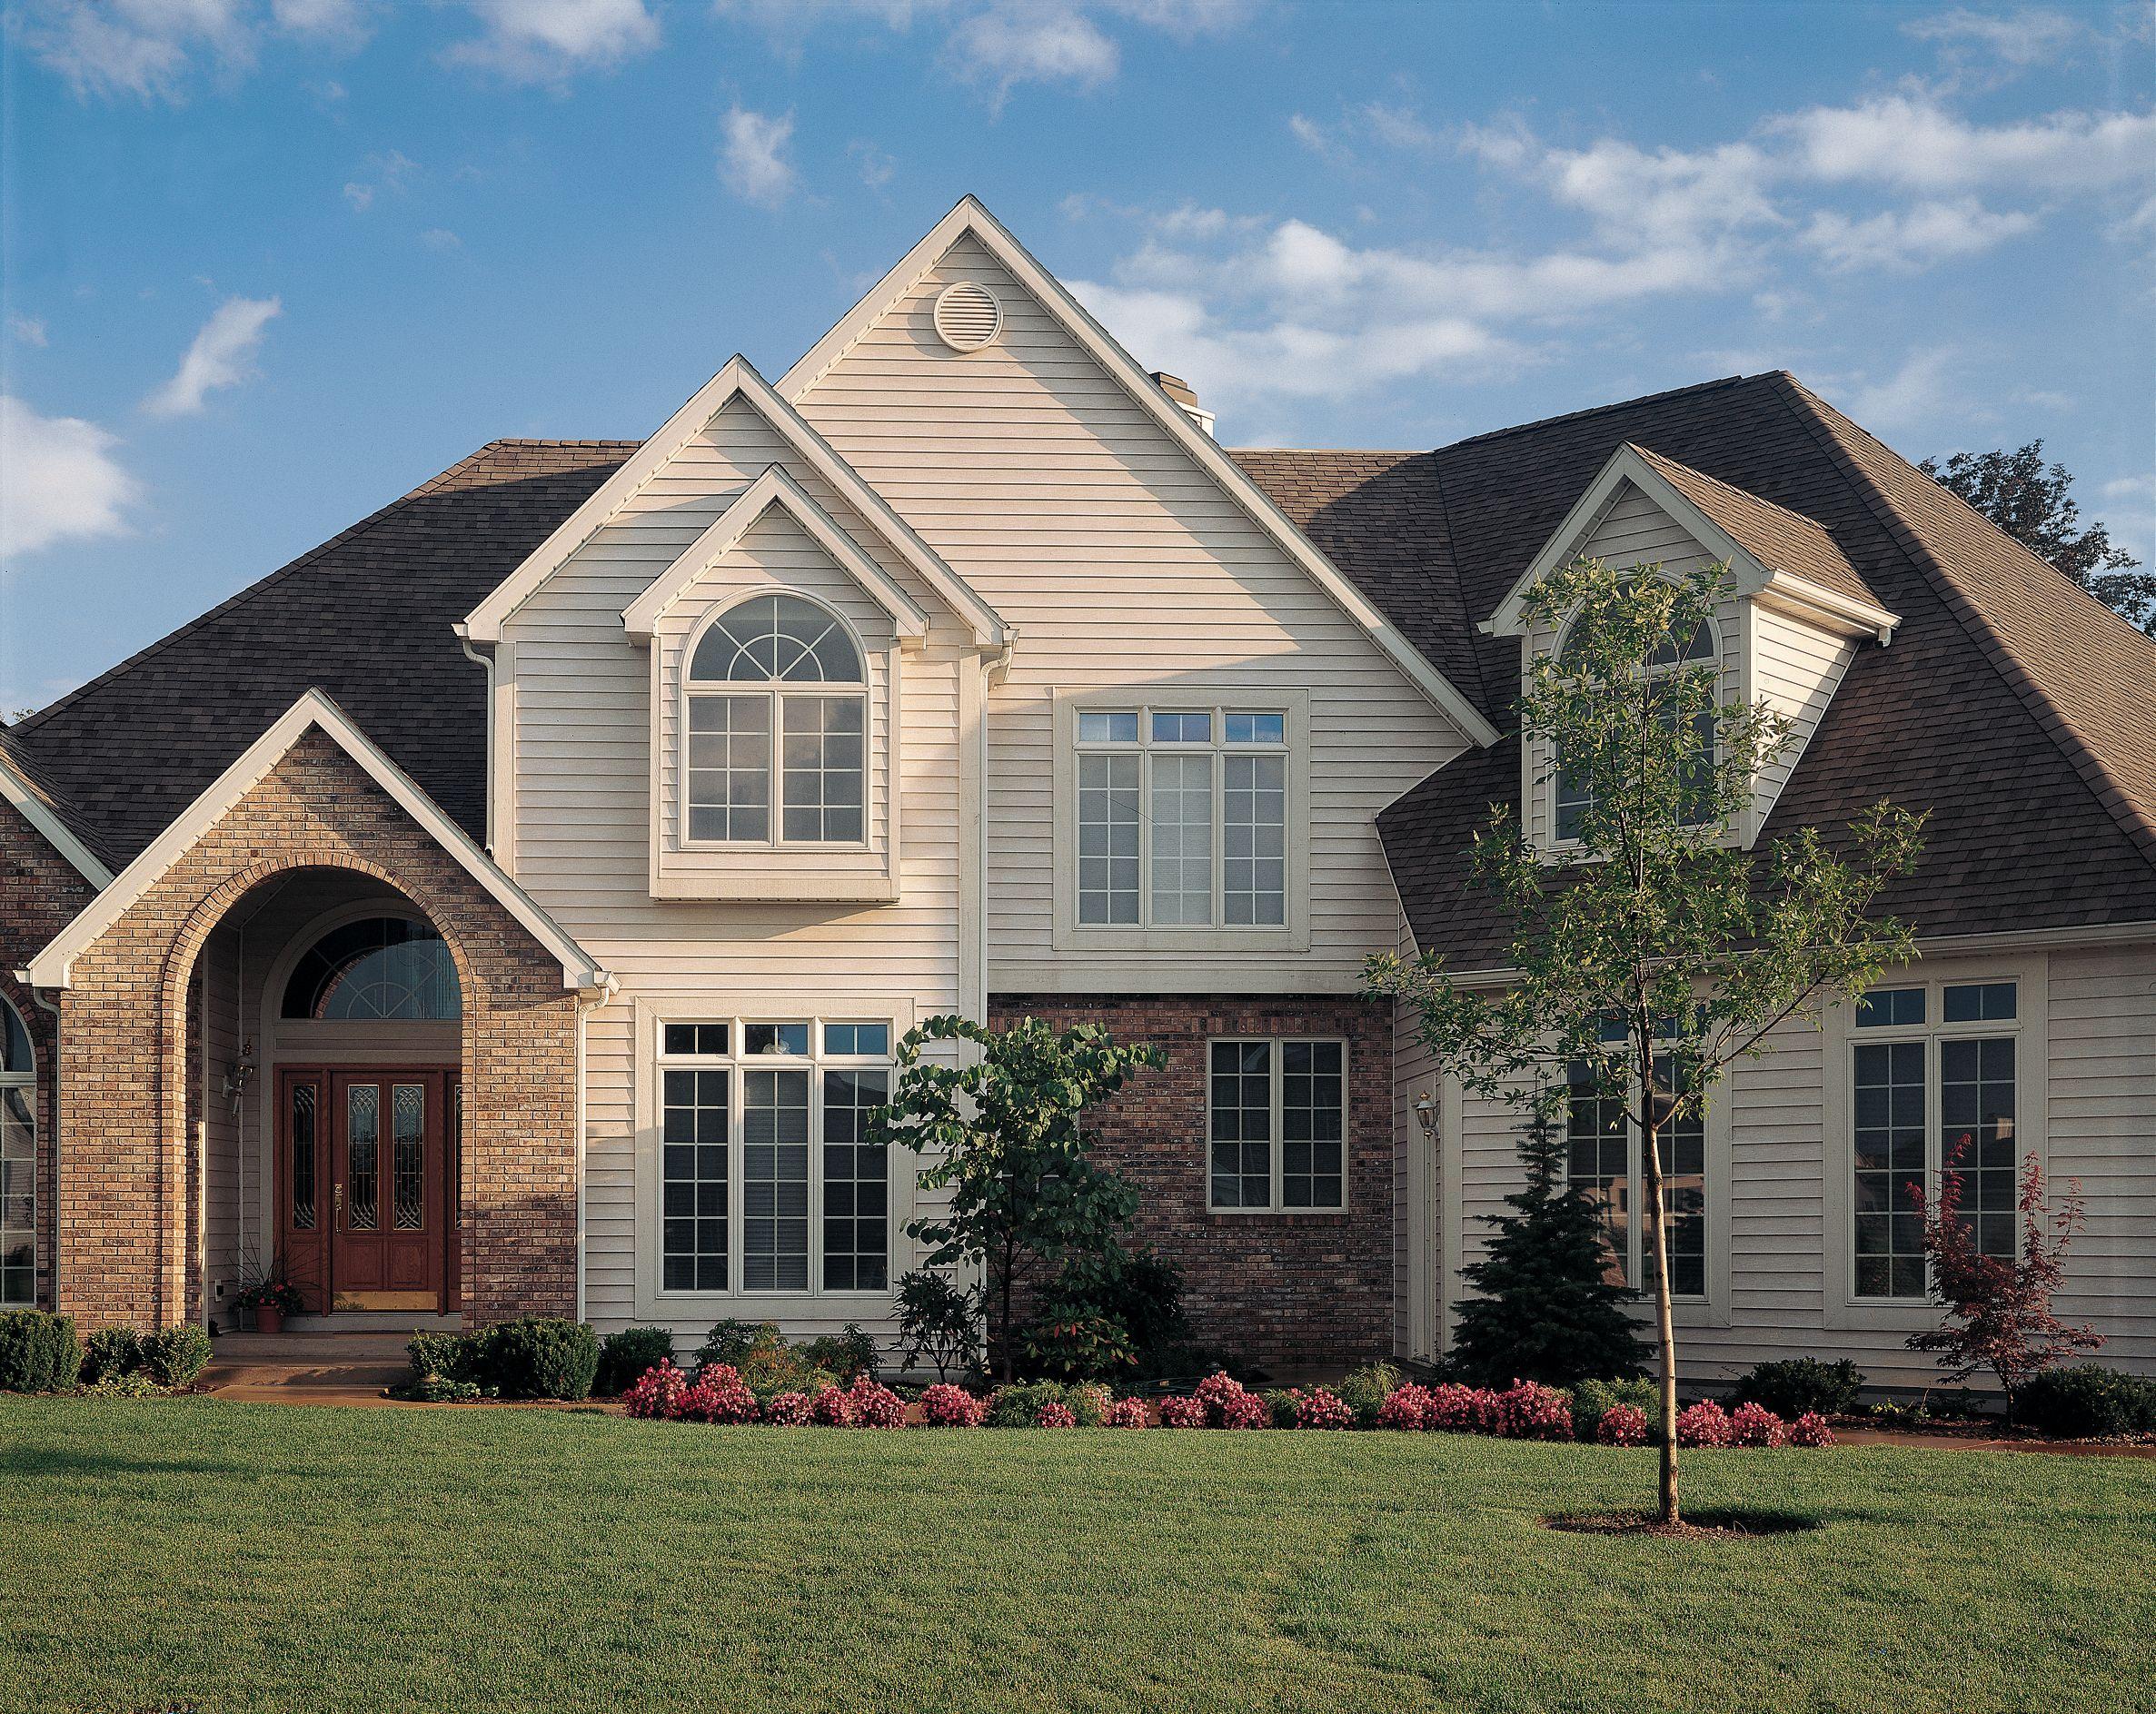 mastic home exteriors low maintenance siding thinking of renovating